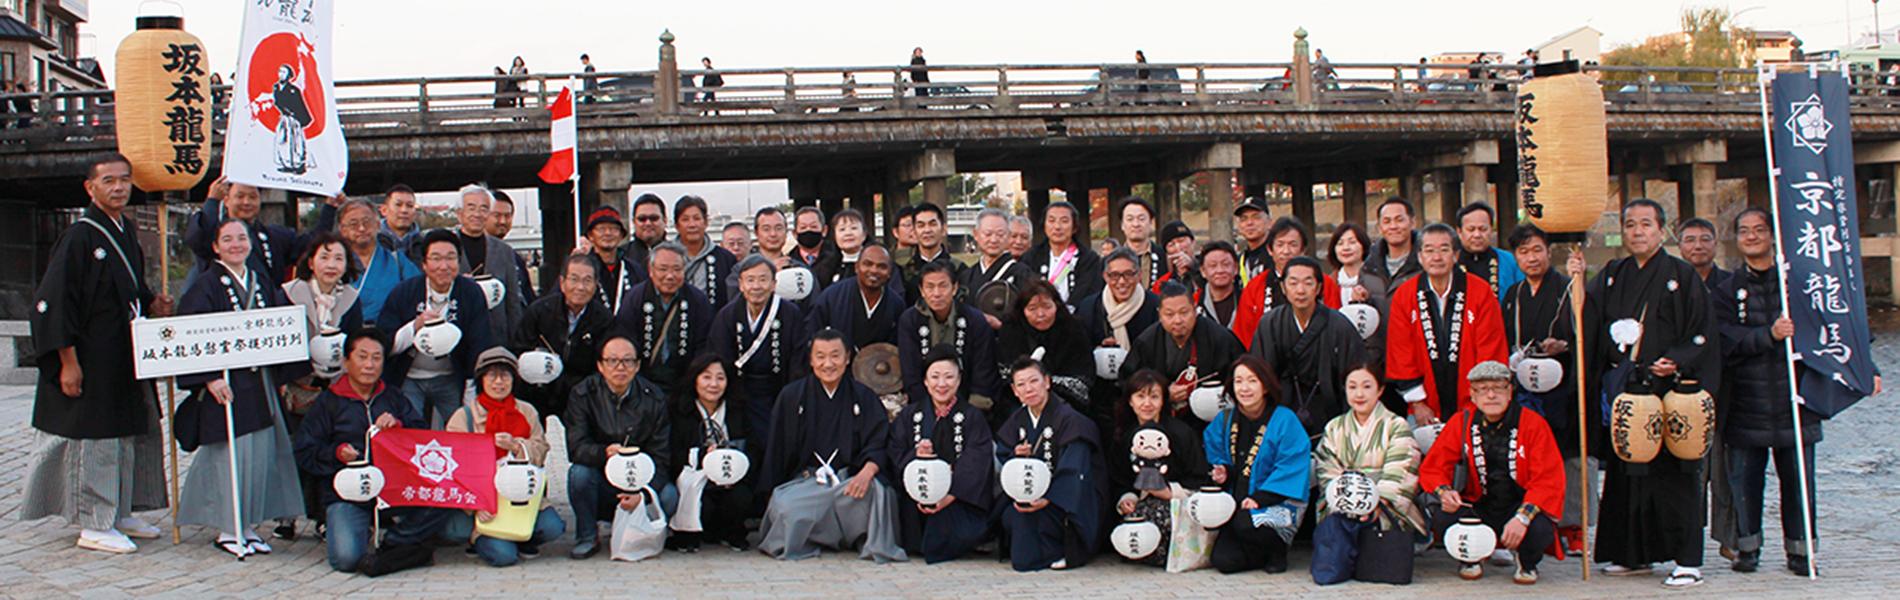 京都龍馬会 三条大橋での集合写真(2019年11月16日)